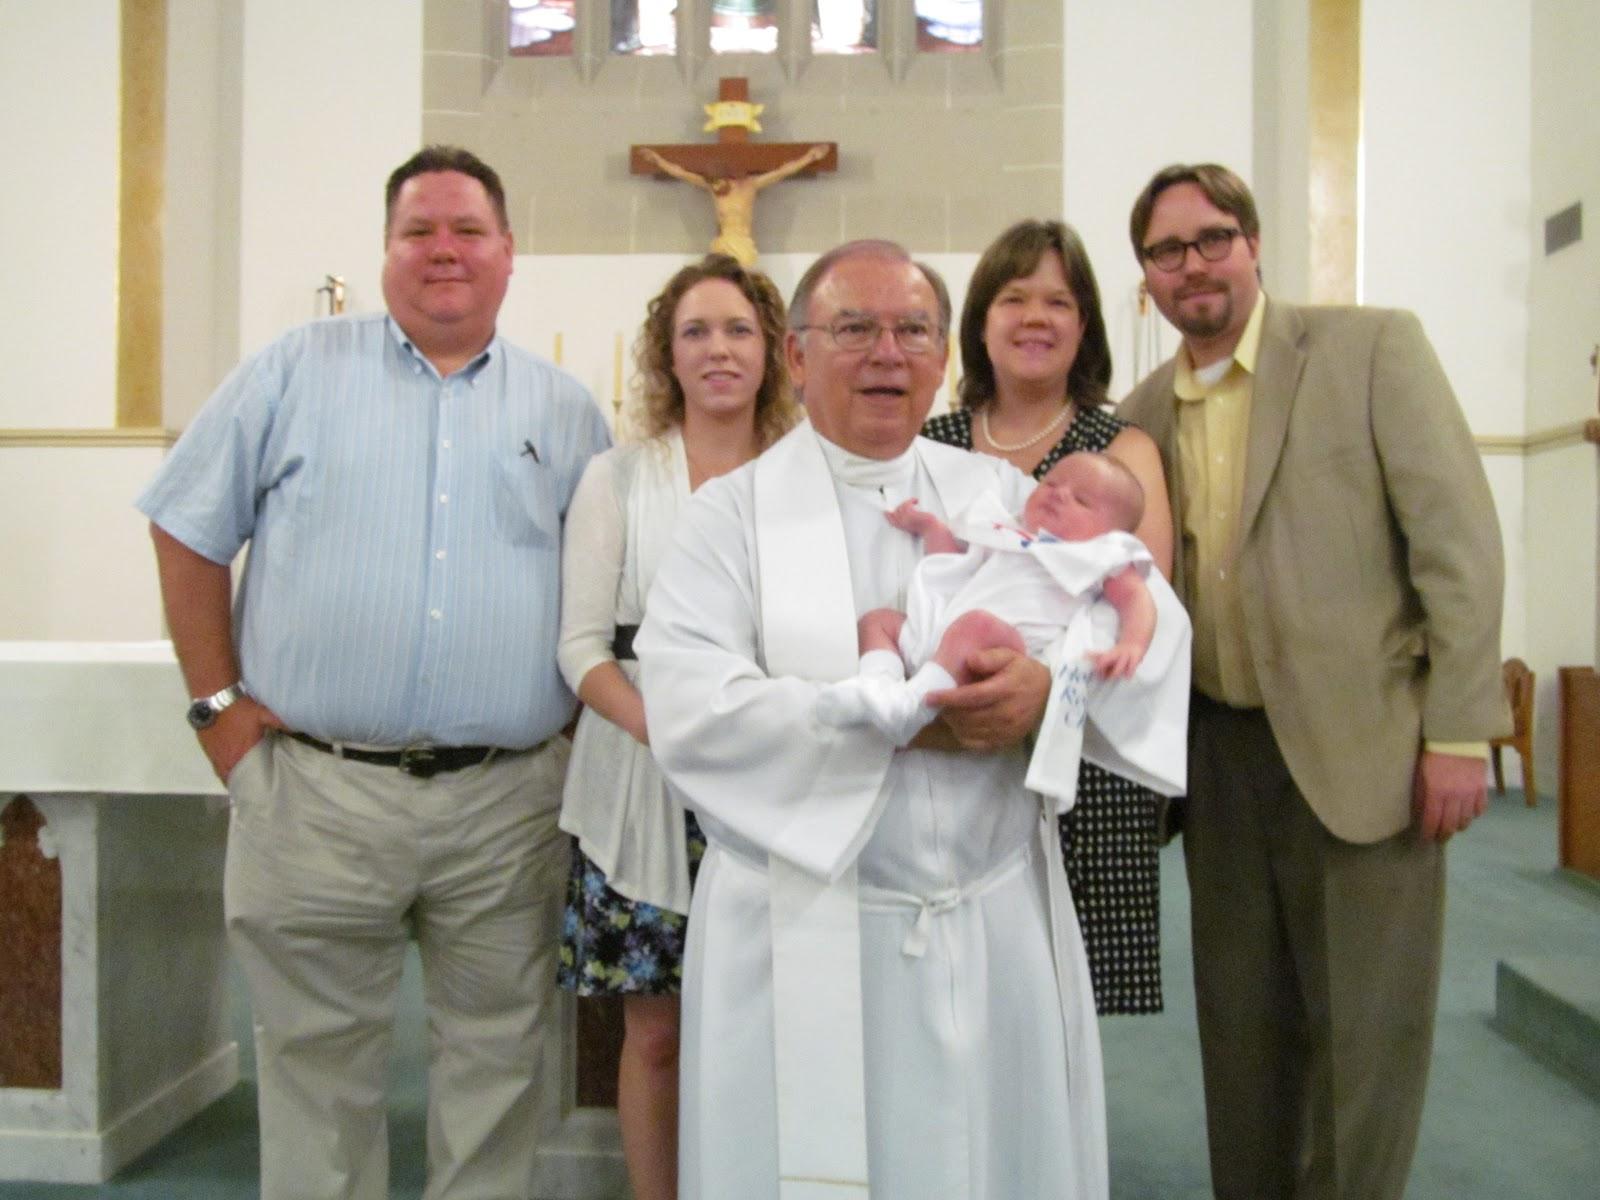 Marshalls Baptism - IMG_0768.JPG